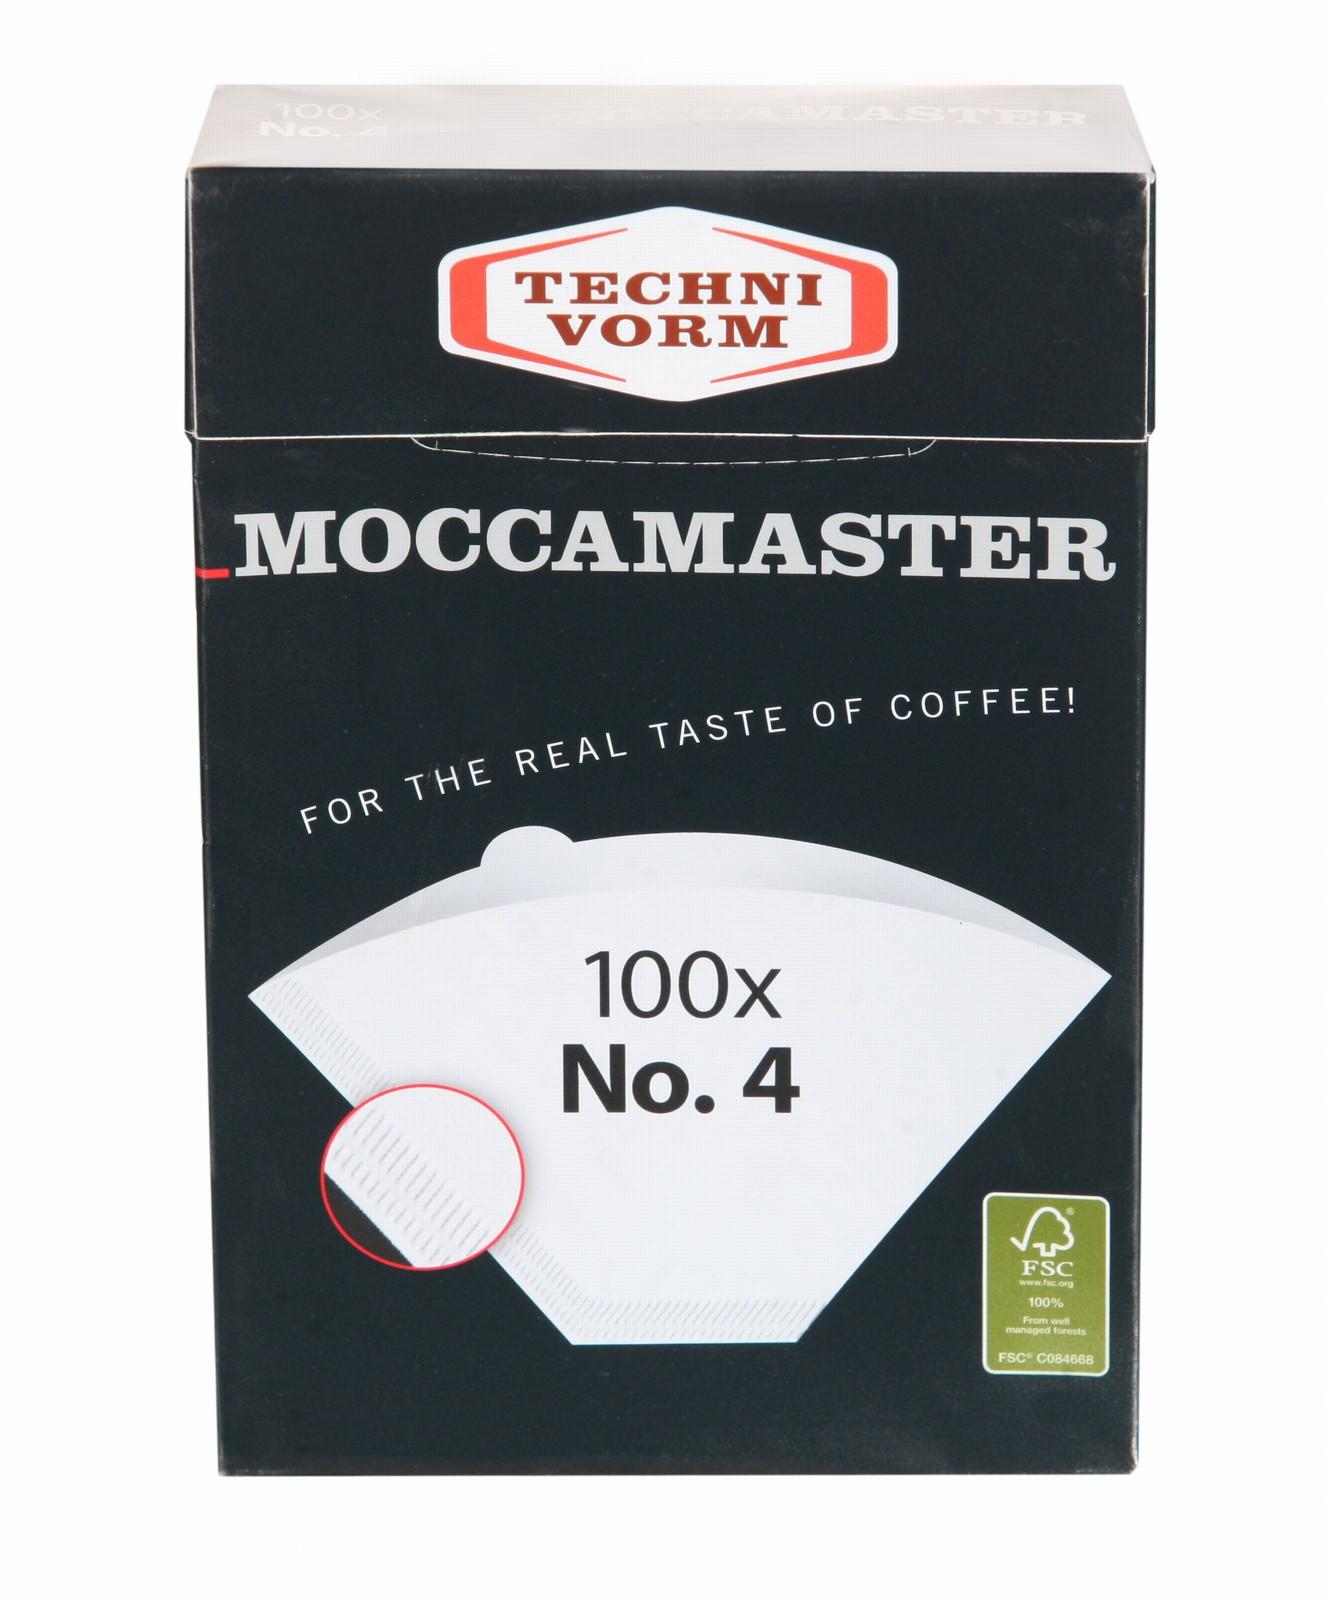 Moccamaster Kaffeefilter weiß Nr. 4